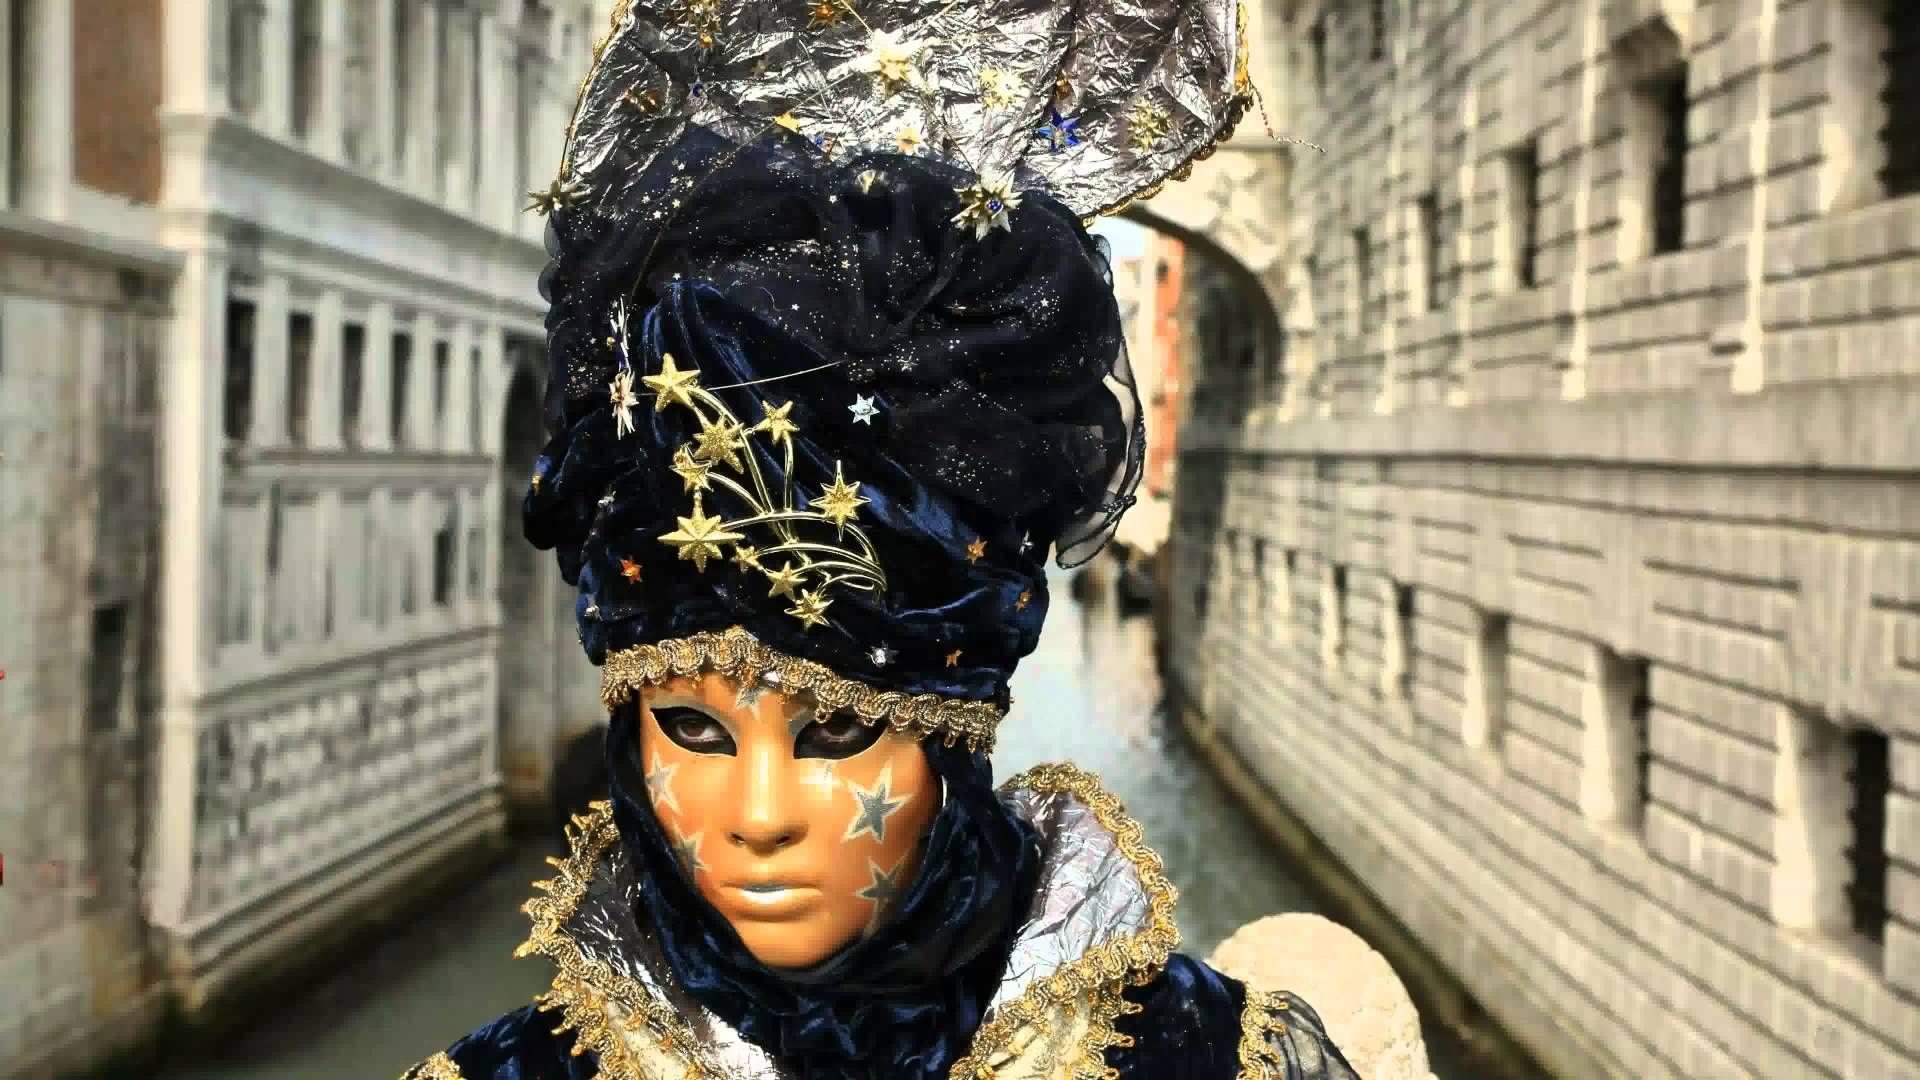 Venice Carnival (Carnevale di Venezia) Stunning Images in ...